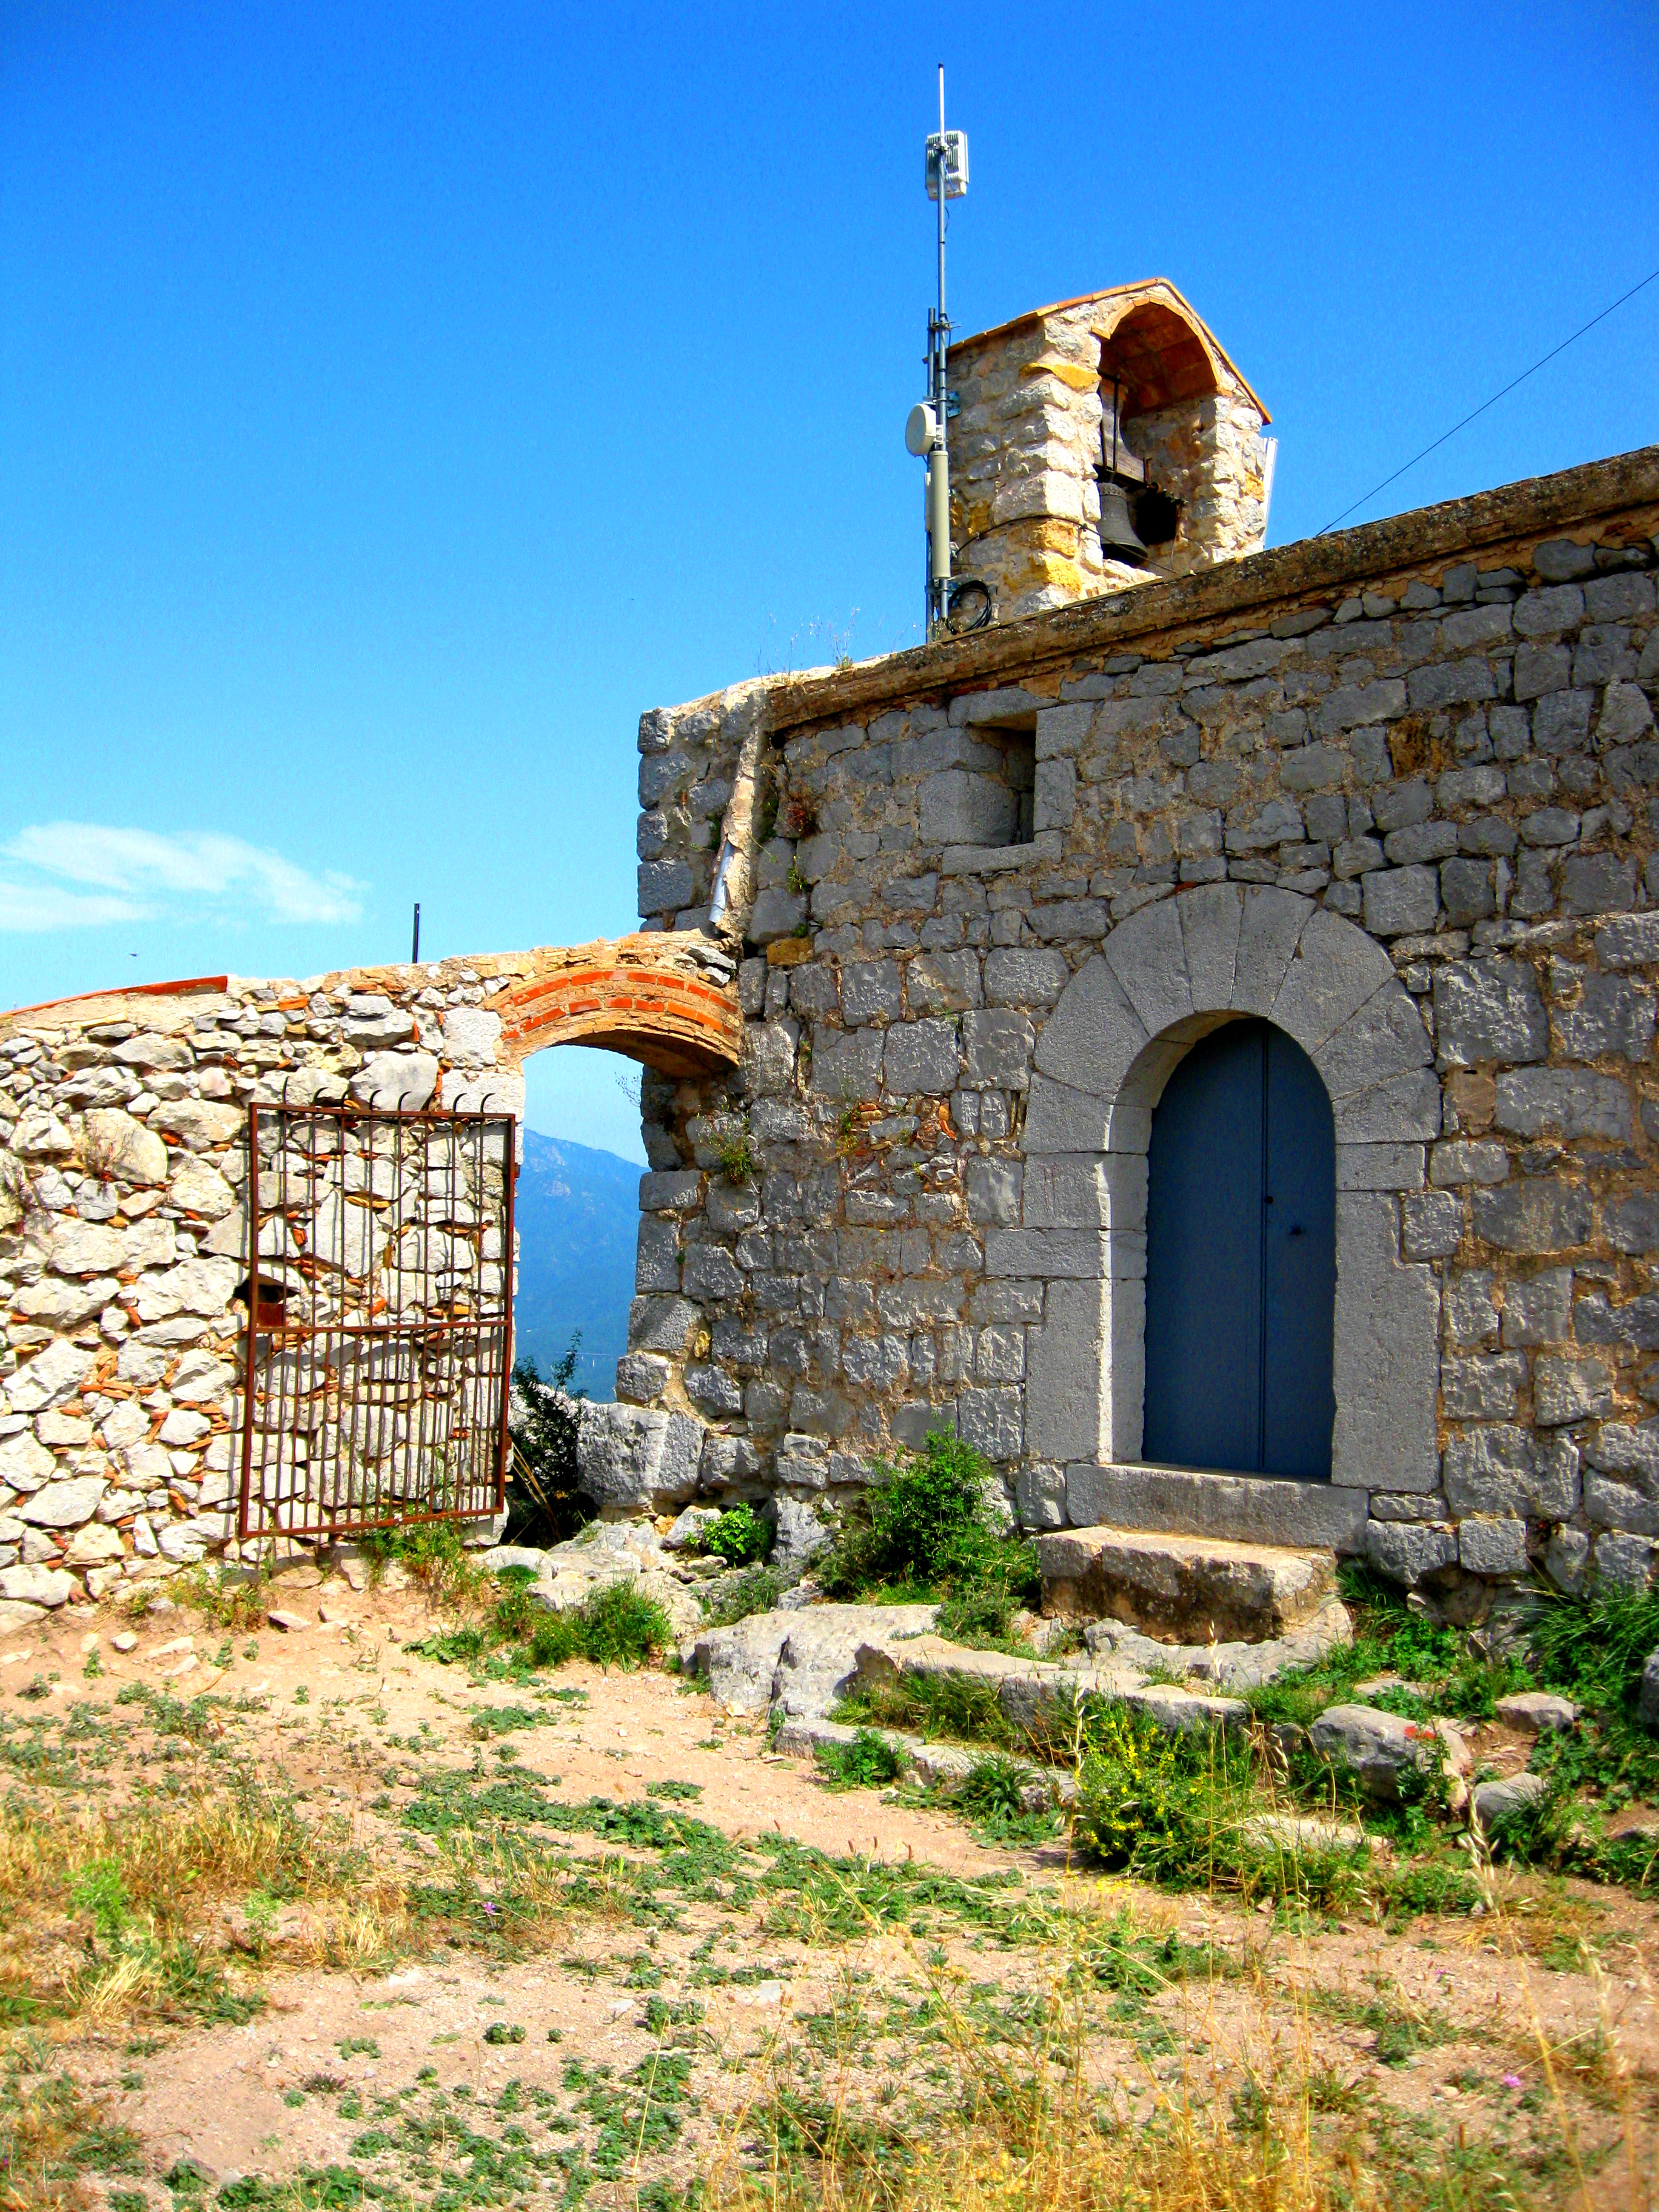 File:Ermita de Santa Magdalena de Terrades 2013 ( 3).JPG - Wikimedia Commons